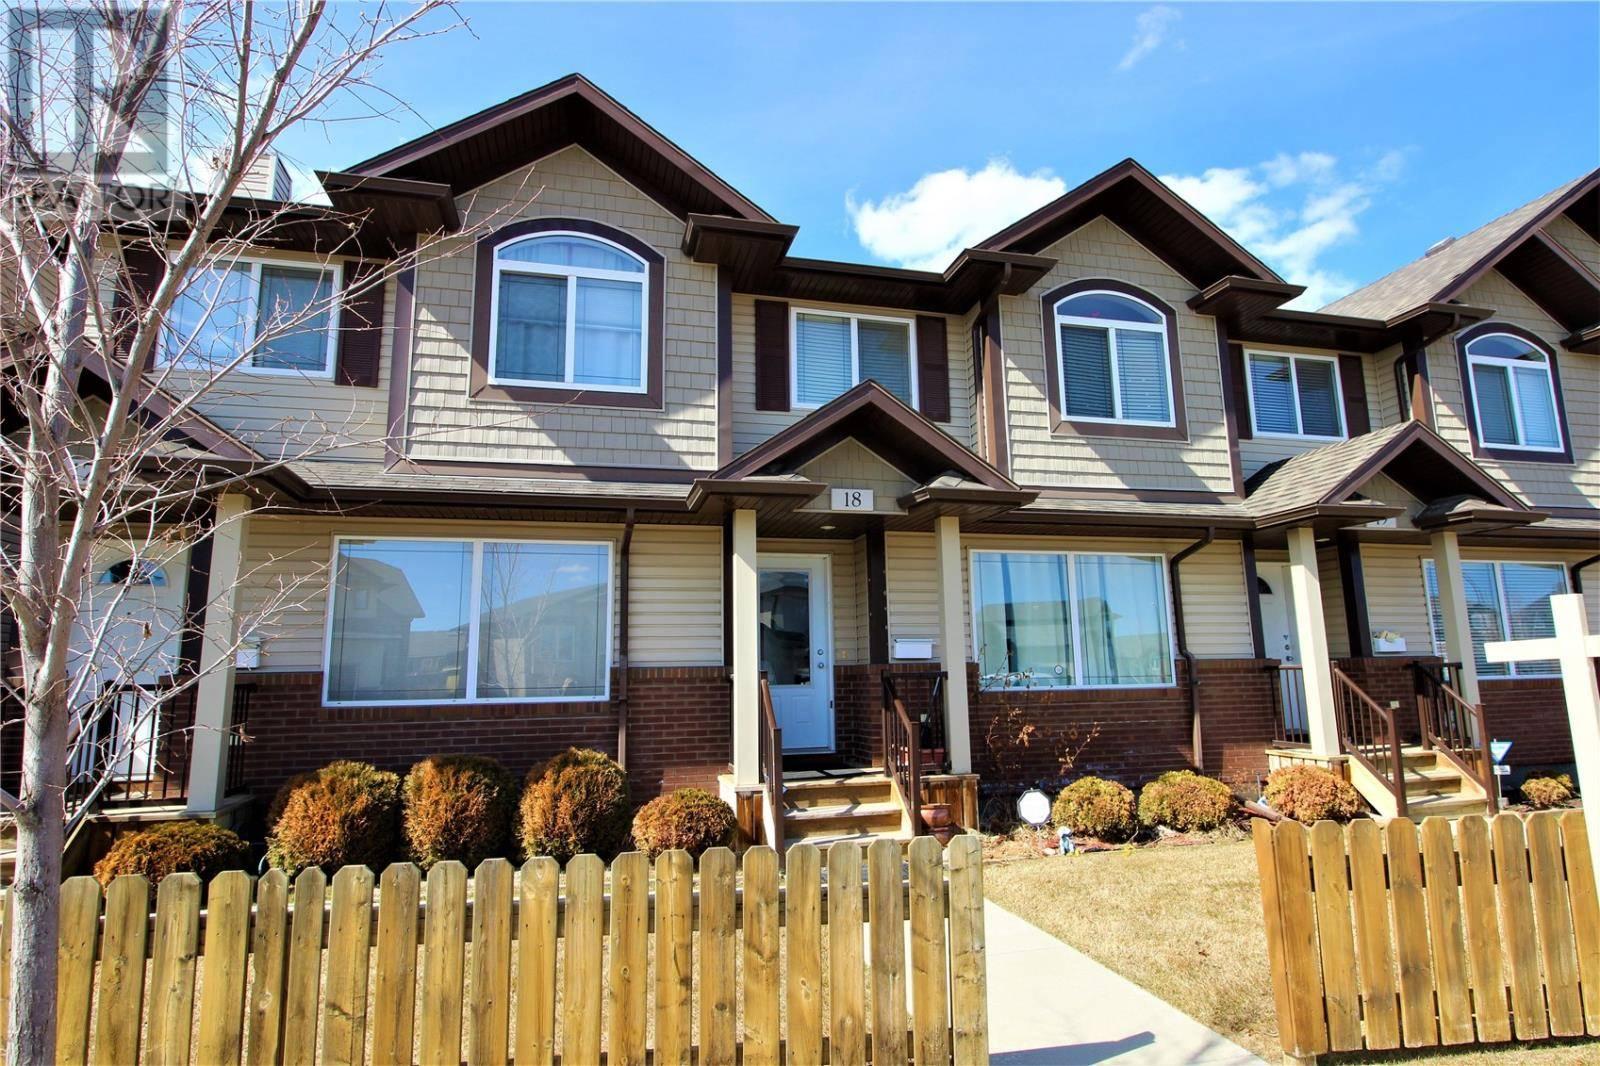 Townhouse for sale at 622 Lamarsh Rd Unit 18 Saskatoon Saskatchewan - MLS: SK767017